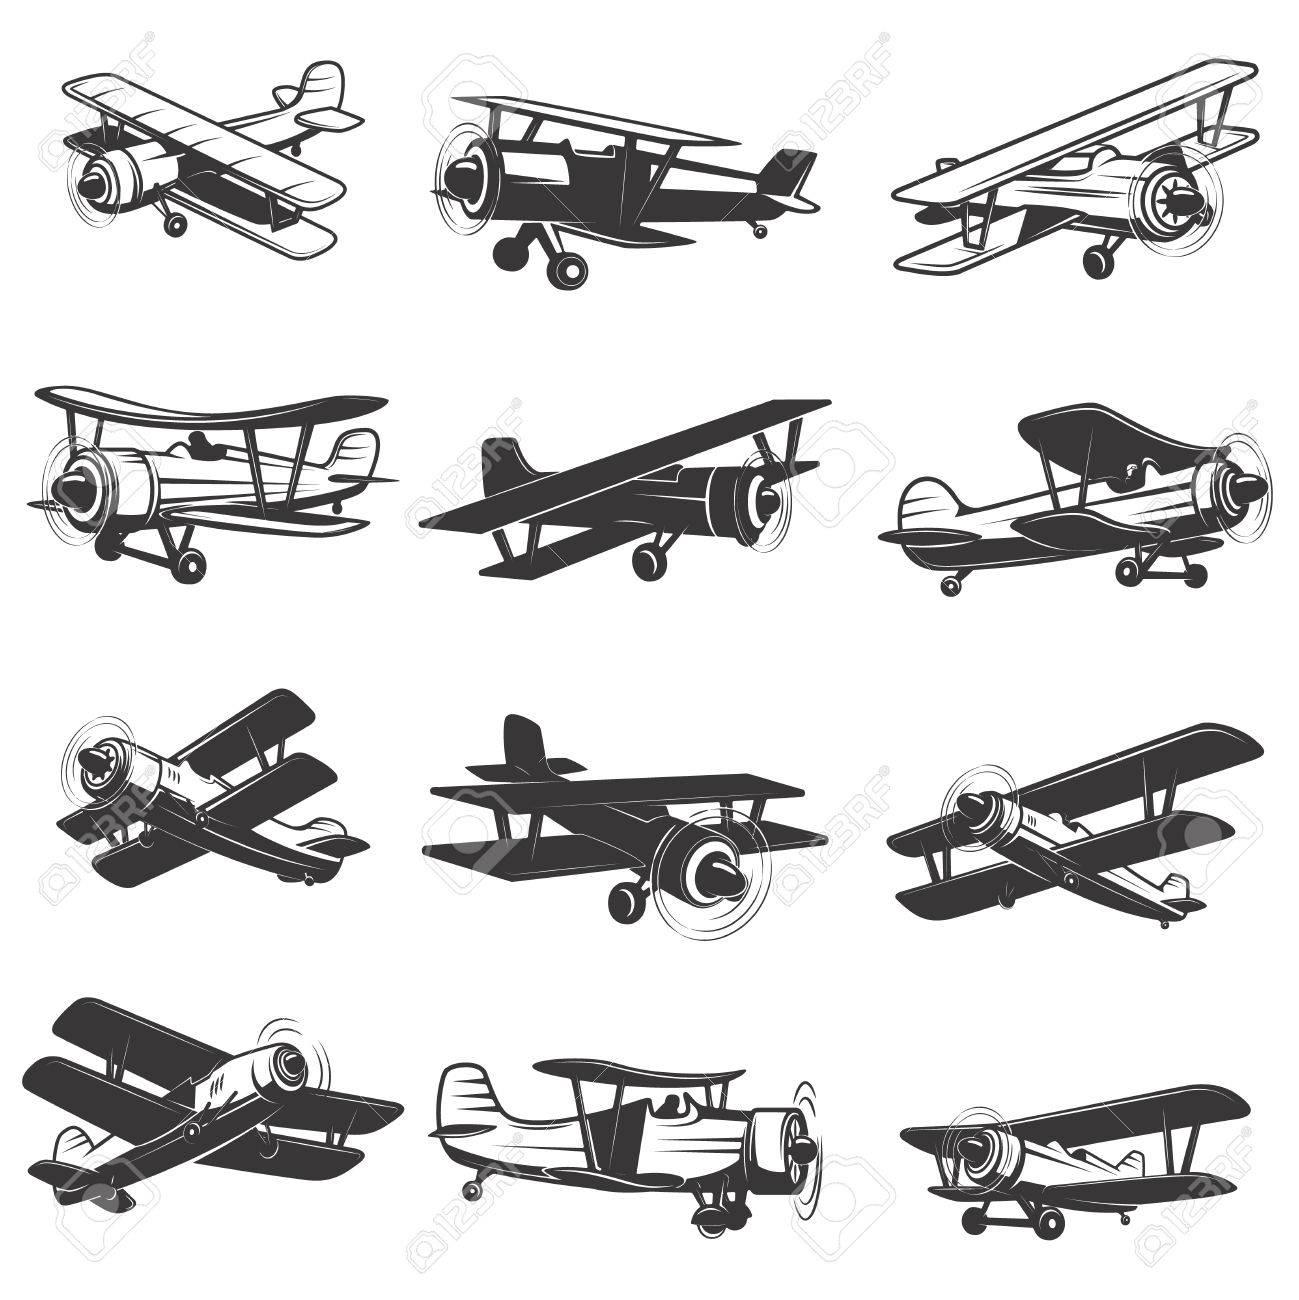 set of vintage airplanes icons. Aircraft illustrations. Design element for label, emblem, sign. - 72782405